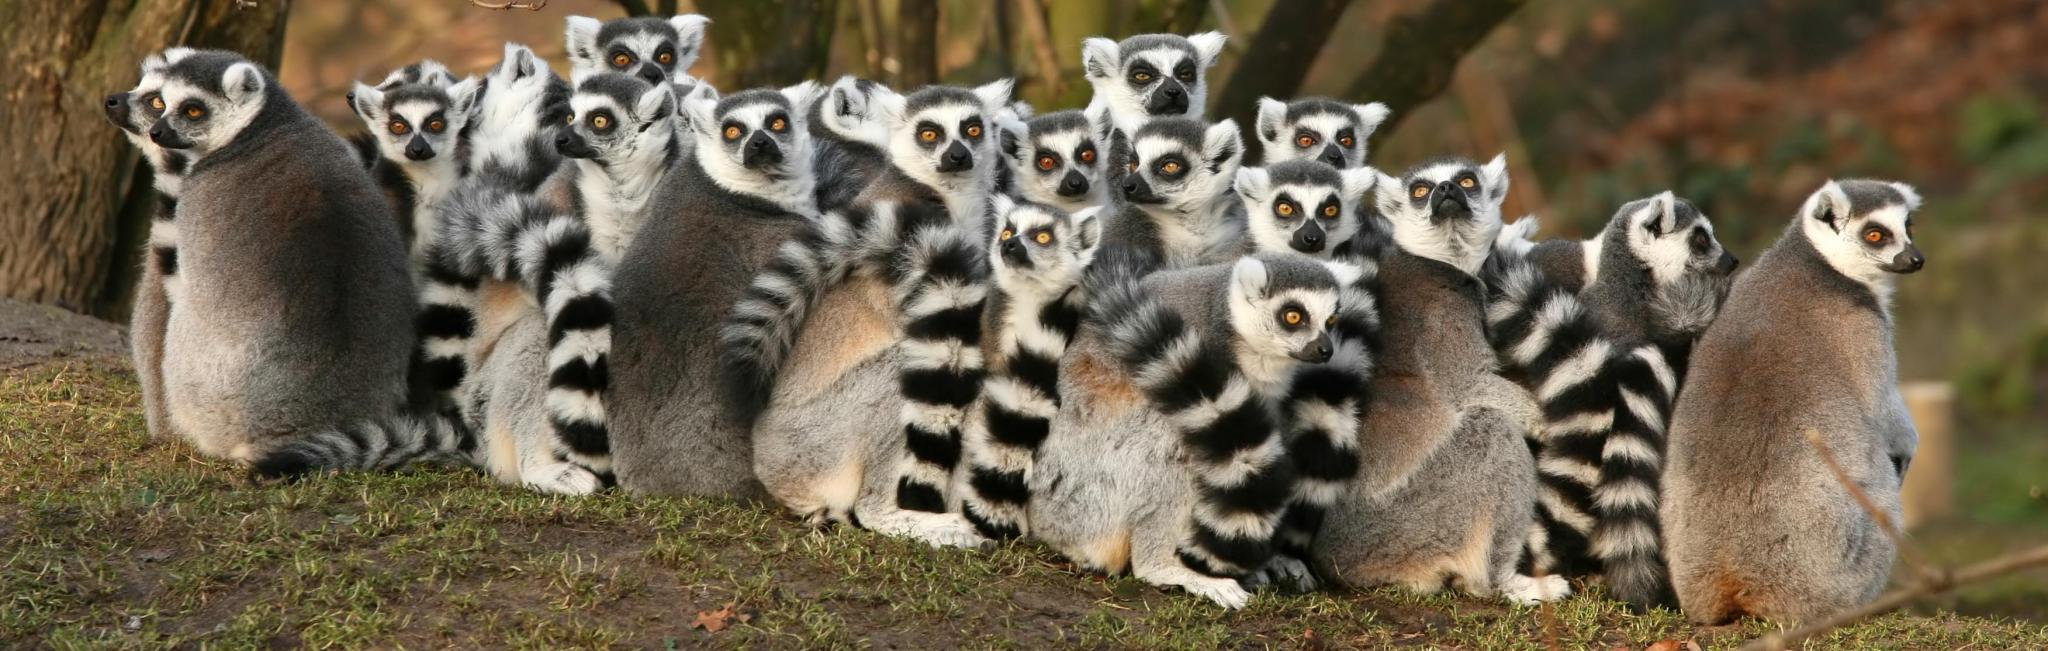 Africa-madagascar-group-of-lemurs